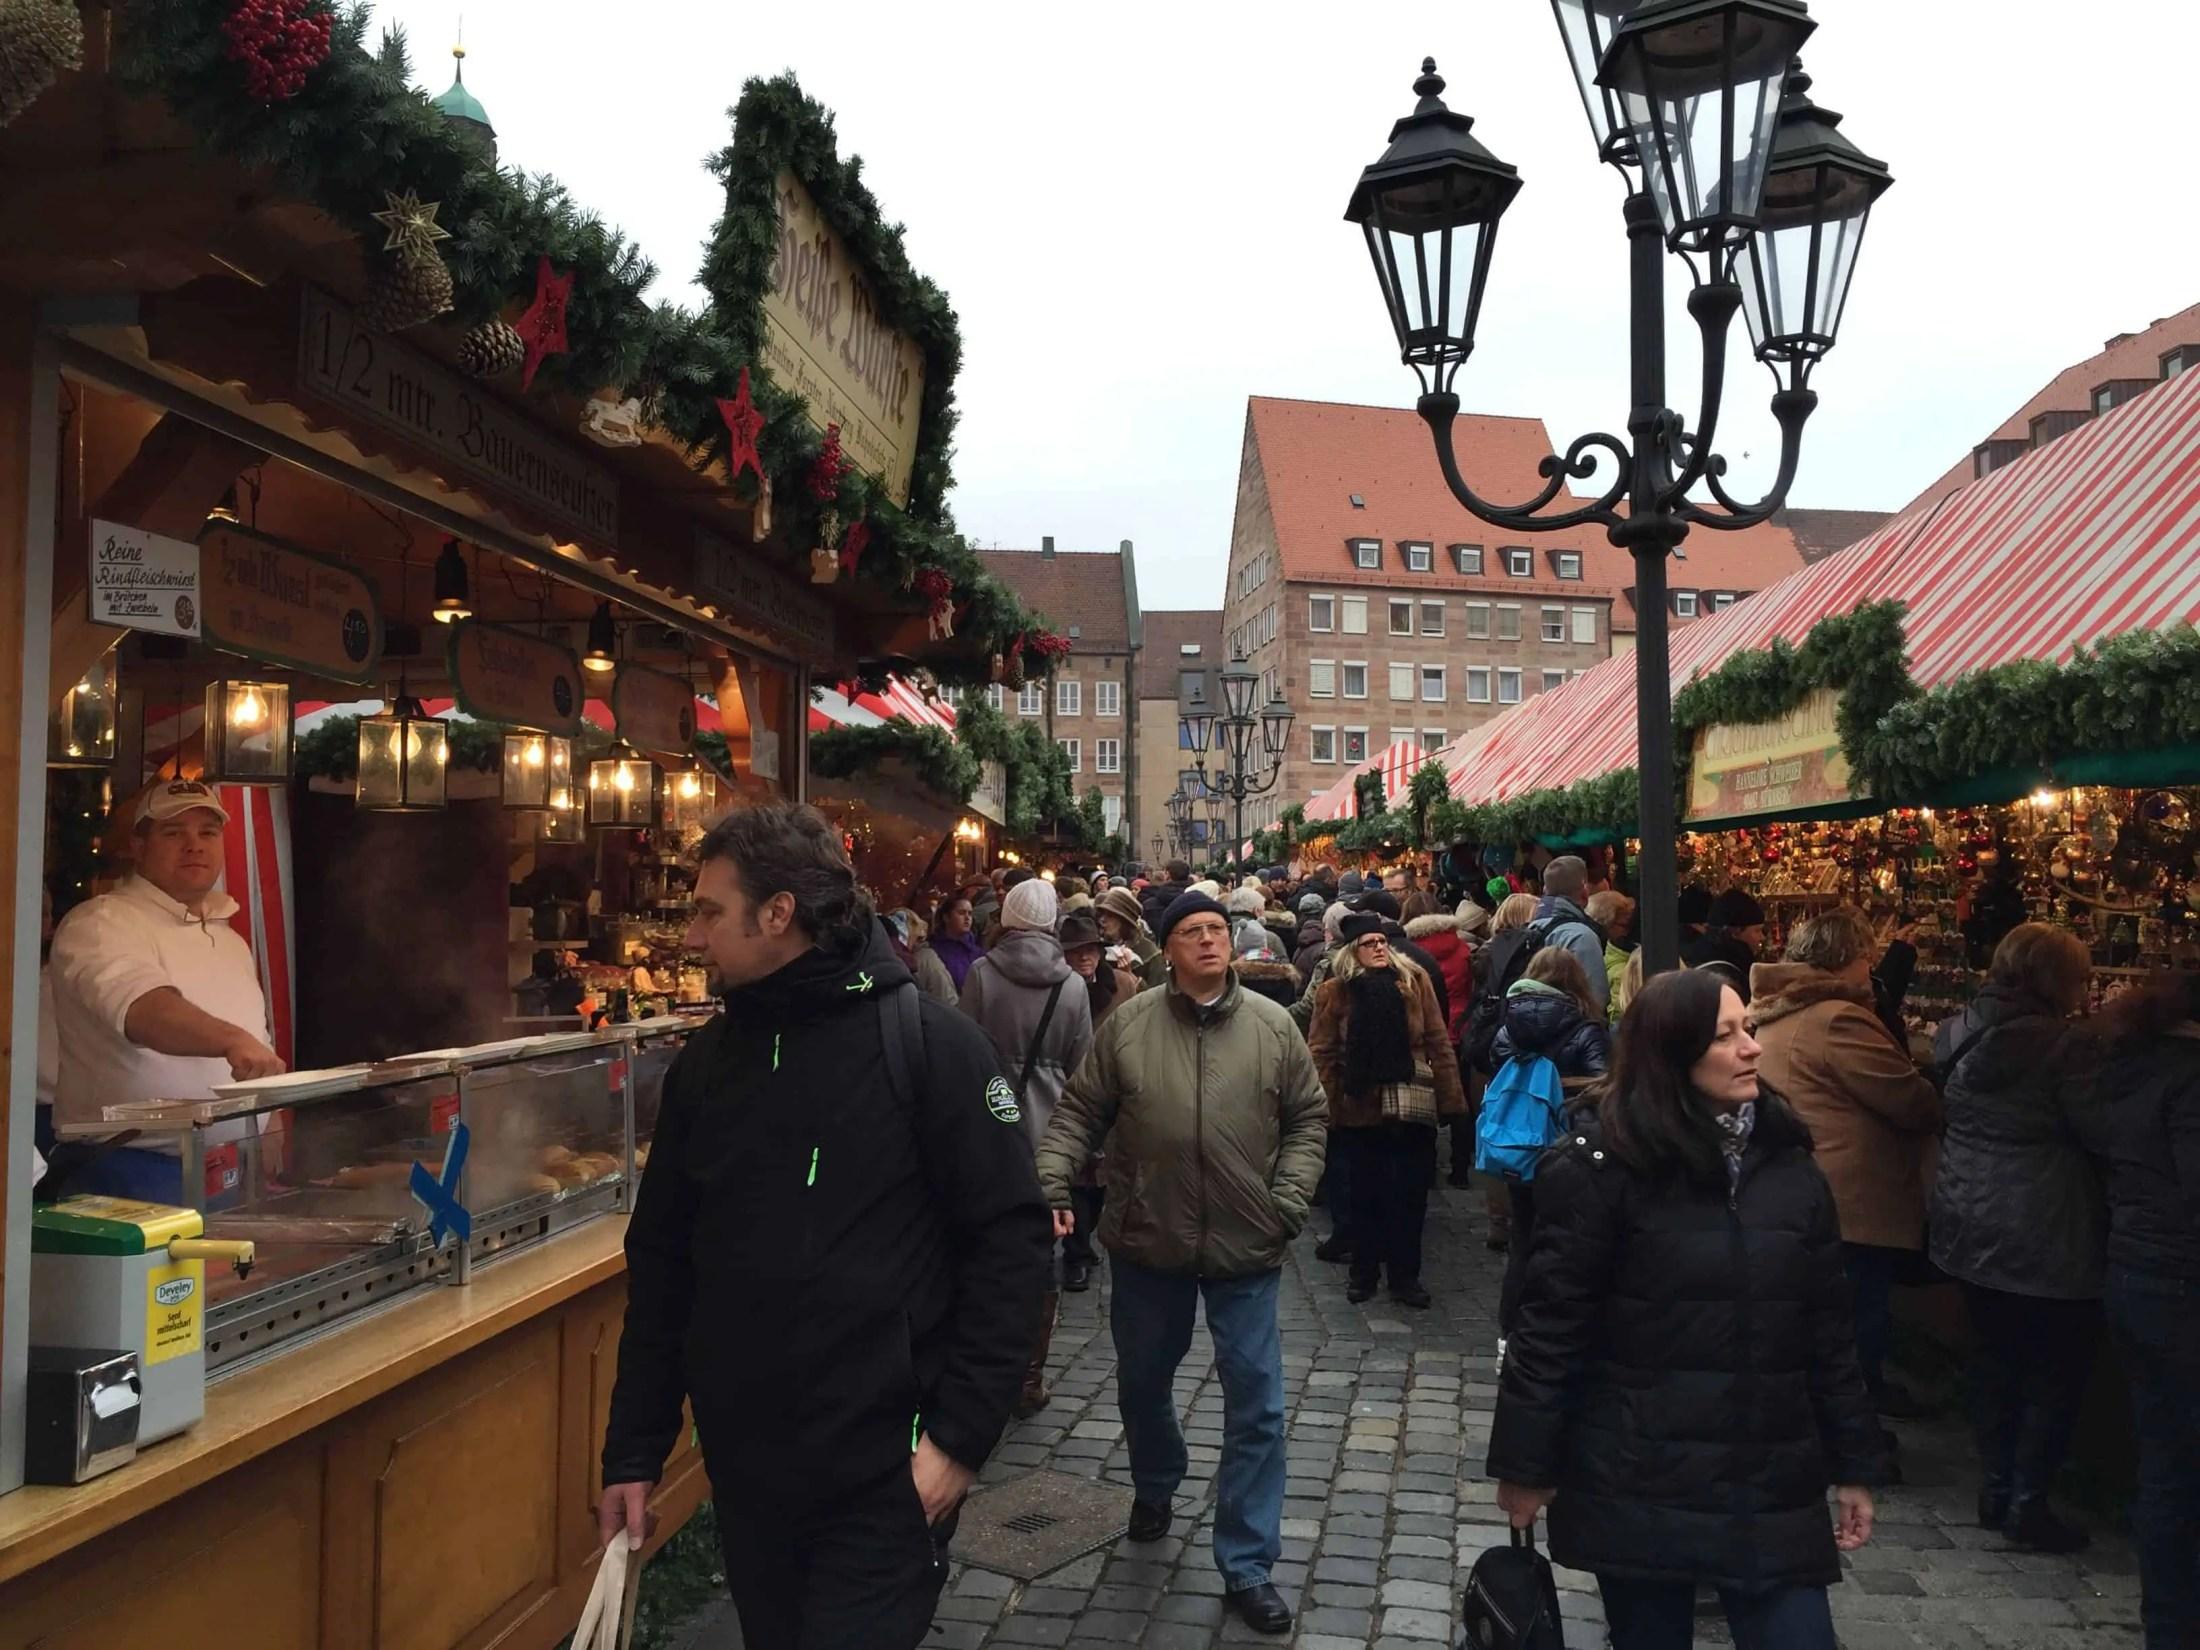 Nuremberg-Christmas-market-stalls-Caiiln-ONeil-travelyourself.ca_